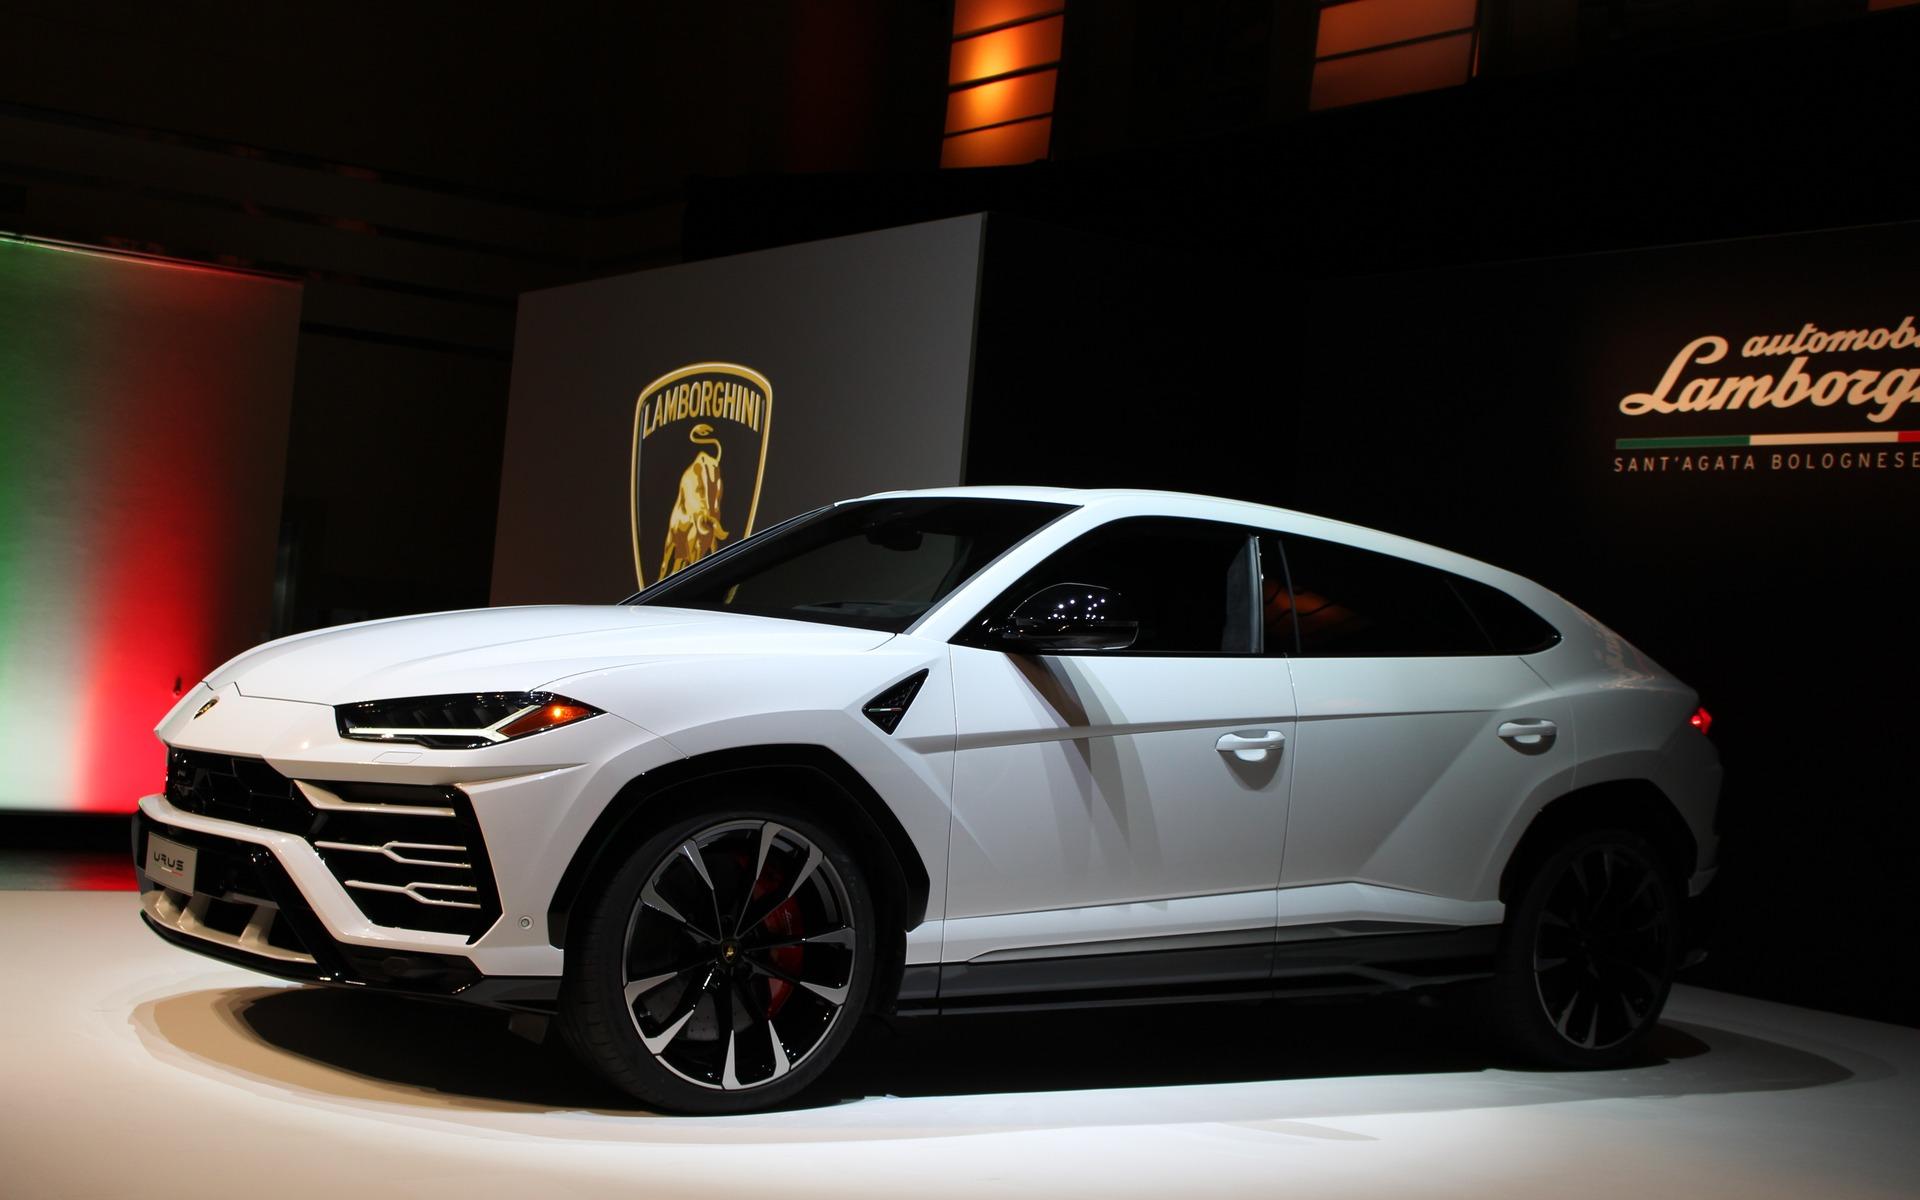 Urus Lamborghini >> 2019 Lamborghini Urus Preview - 3/17